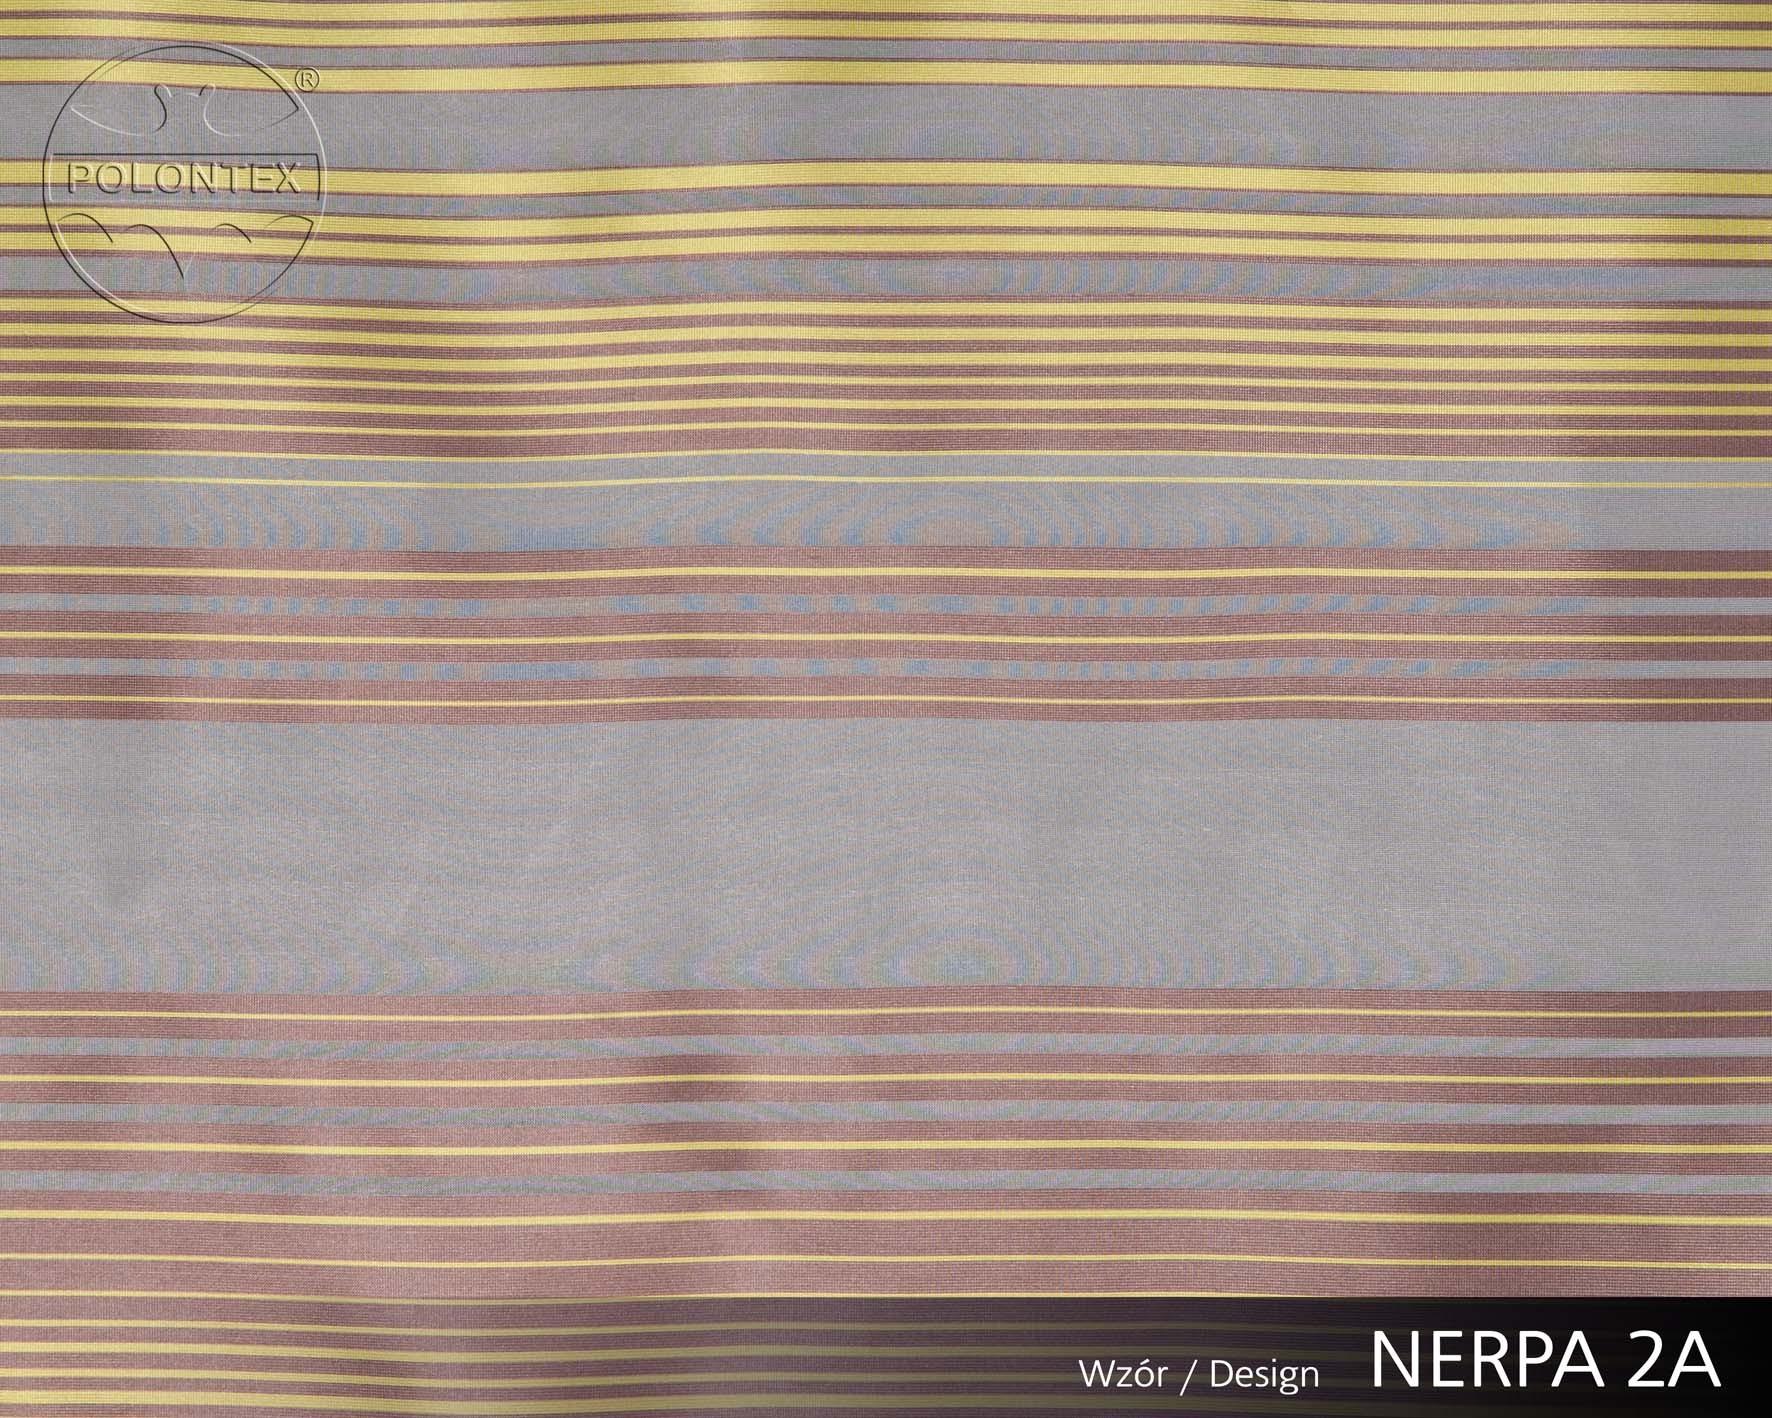 NERPA A253